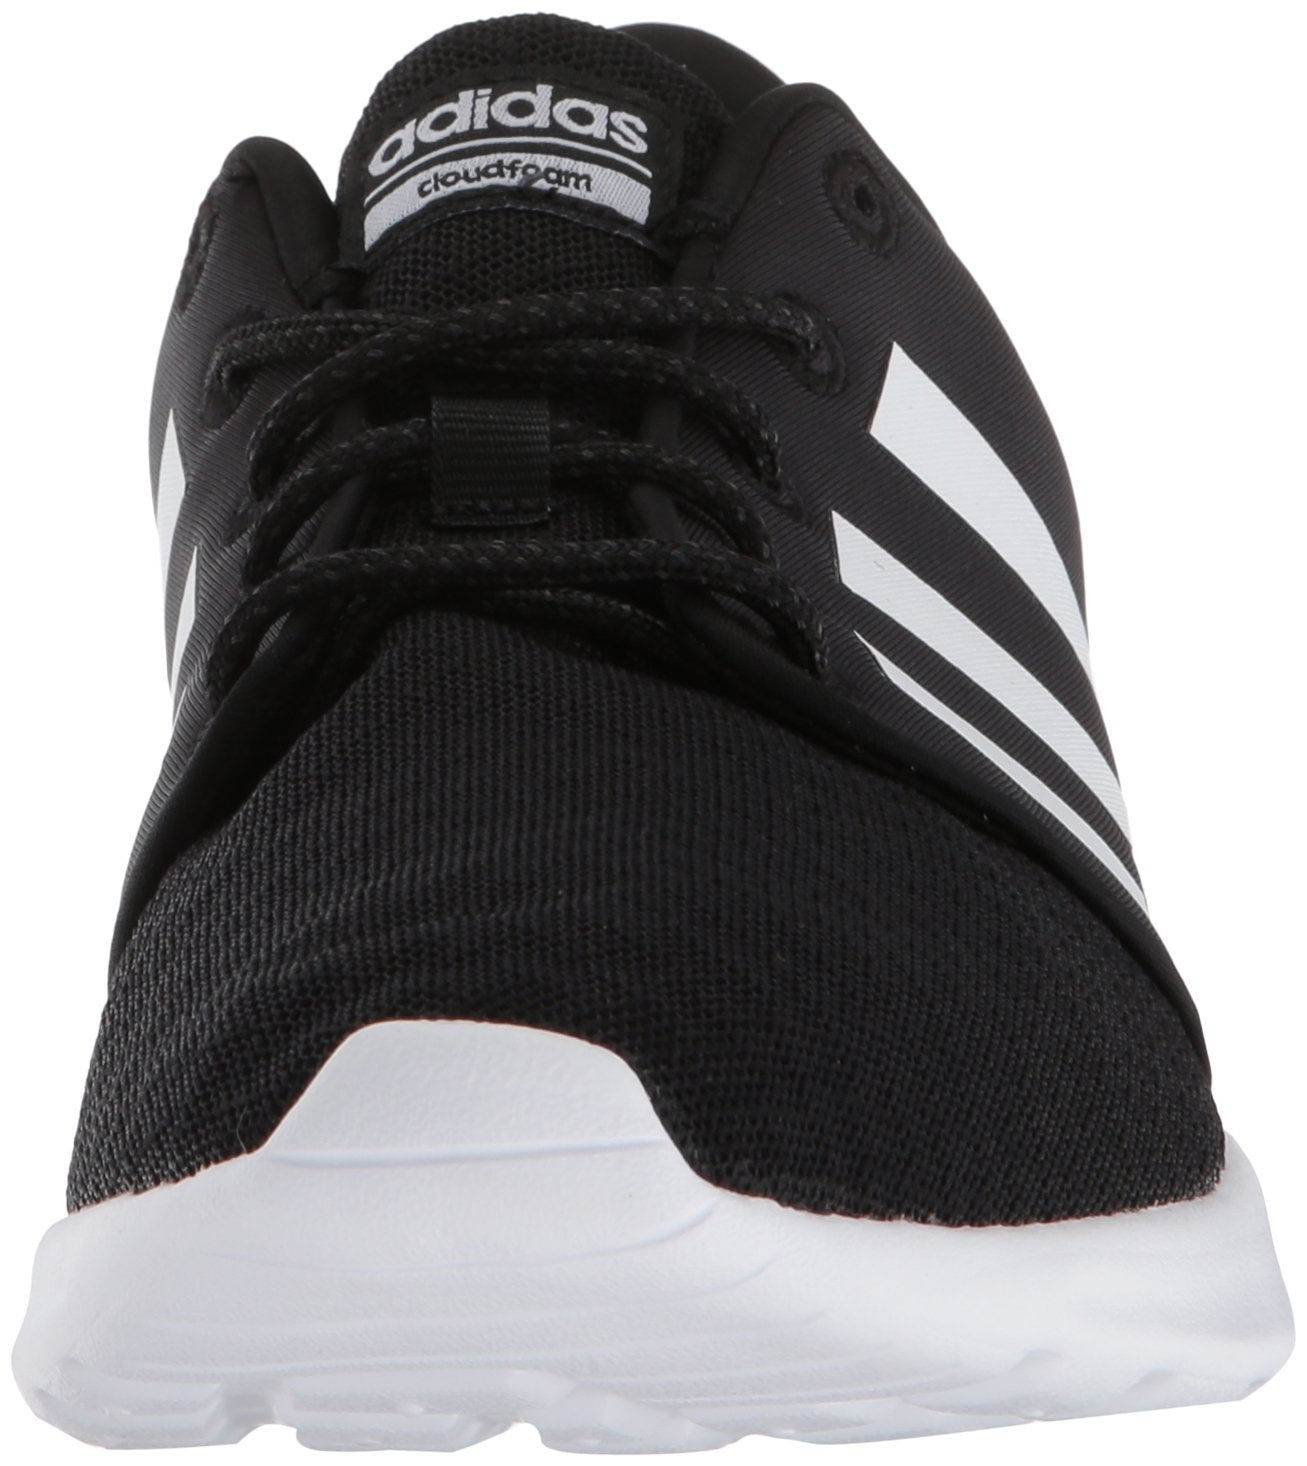 adidas Women's Cloudfoam QT Racer Running Shoe, Black/White/Carbon, 5 M US by adidas (Image #4)